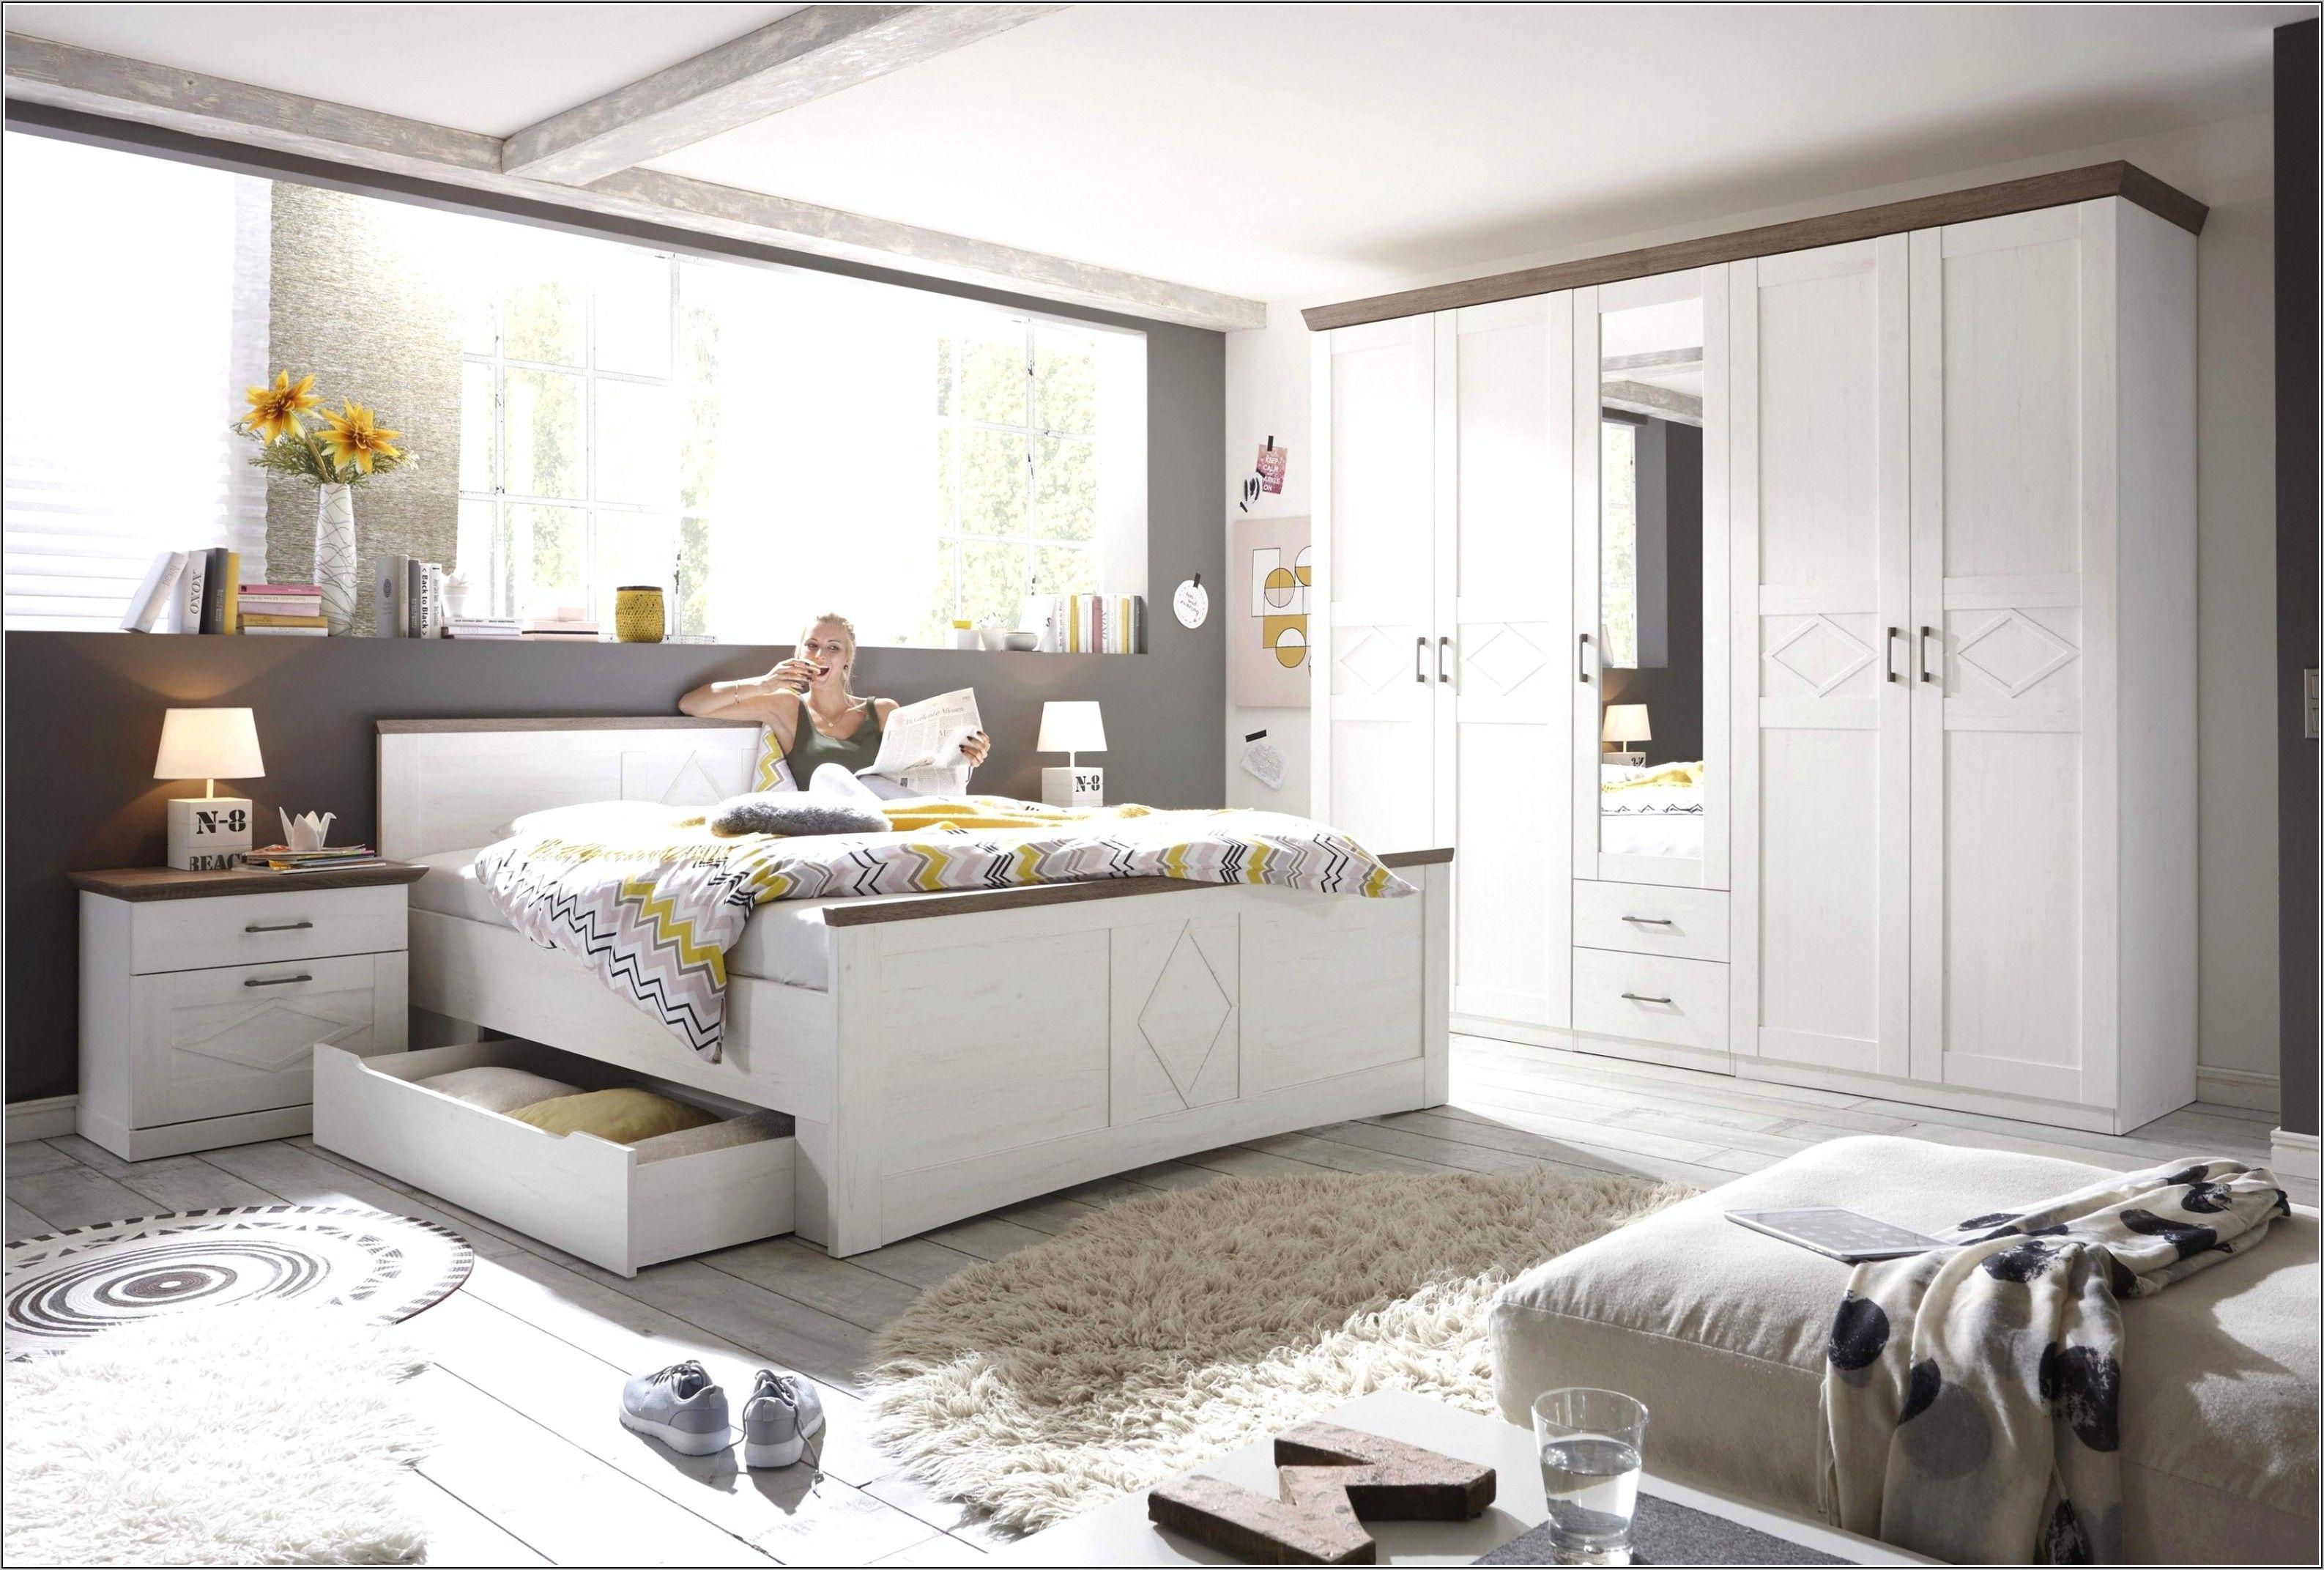 Deco Chambre Ado Fille Meuble Bois En 2020 Deco Chambre Fille Et Garcon Meuble Chambre Deco Chambre Vintage